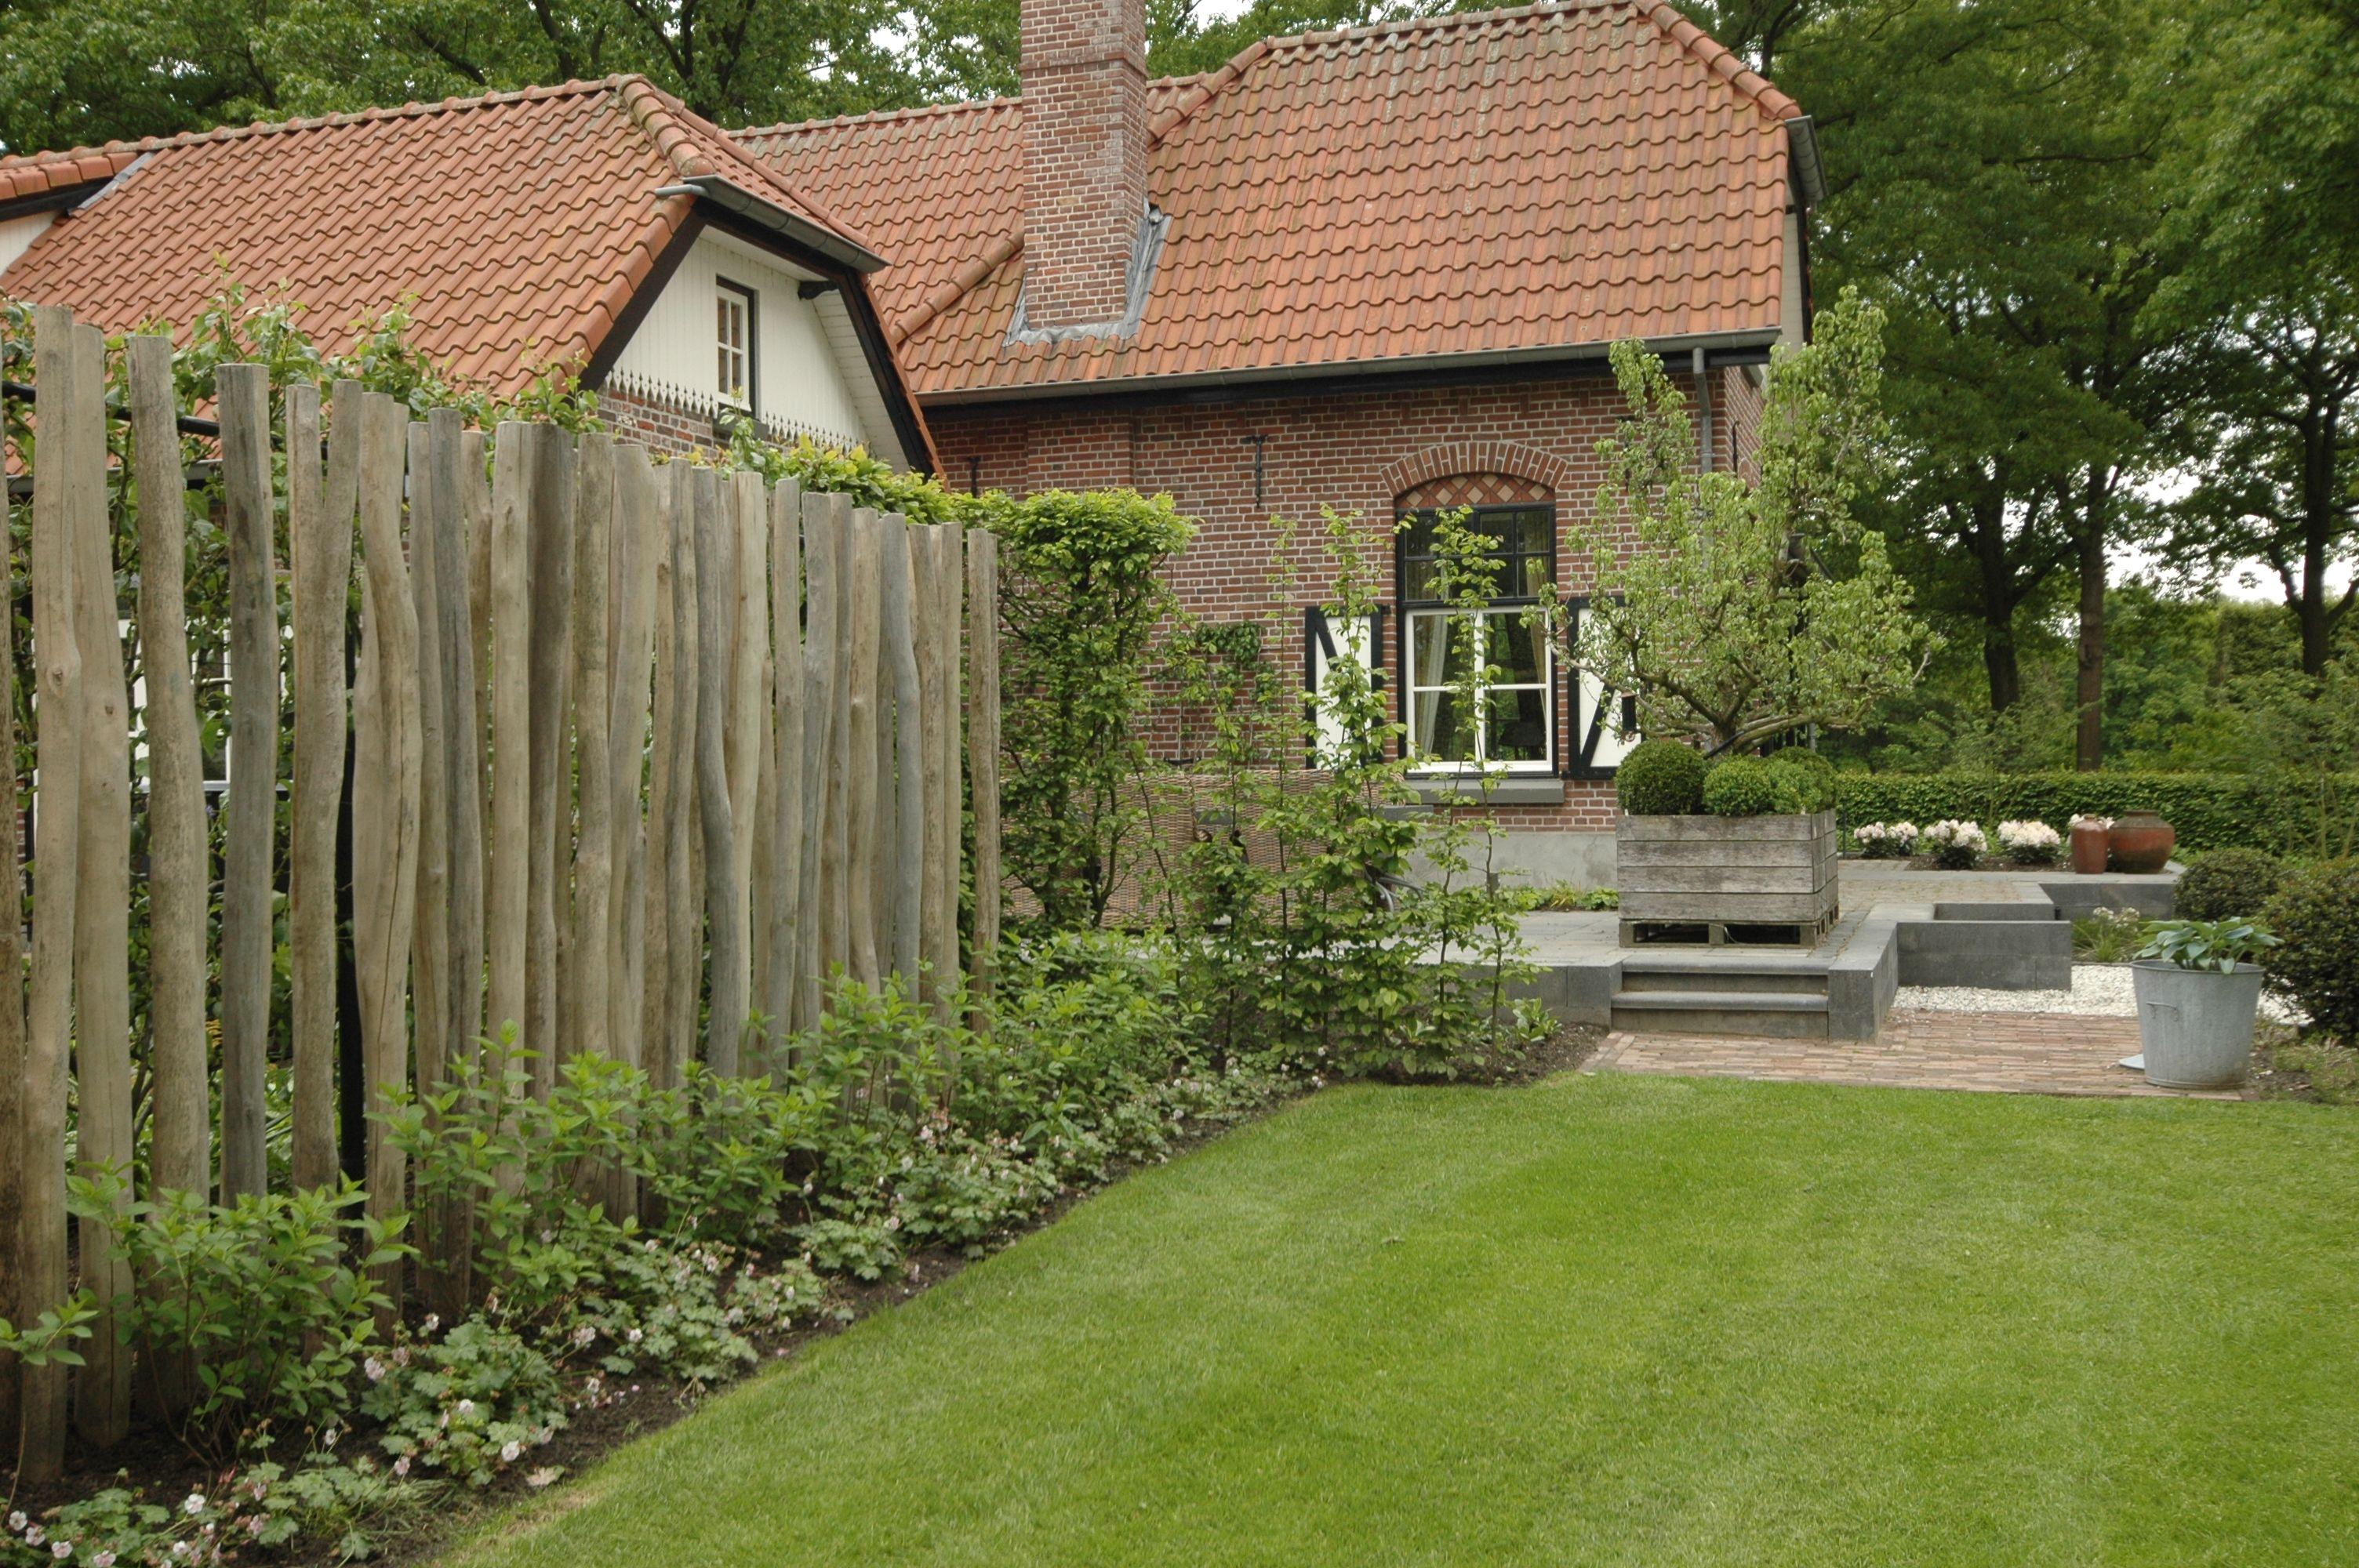 Houten Scheidingswand Tuin : Ronde houten palen in tuin google zoeken tuin garden